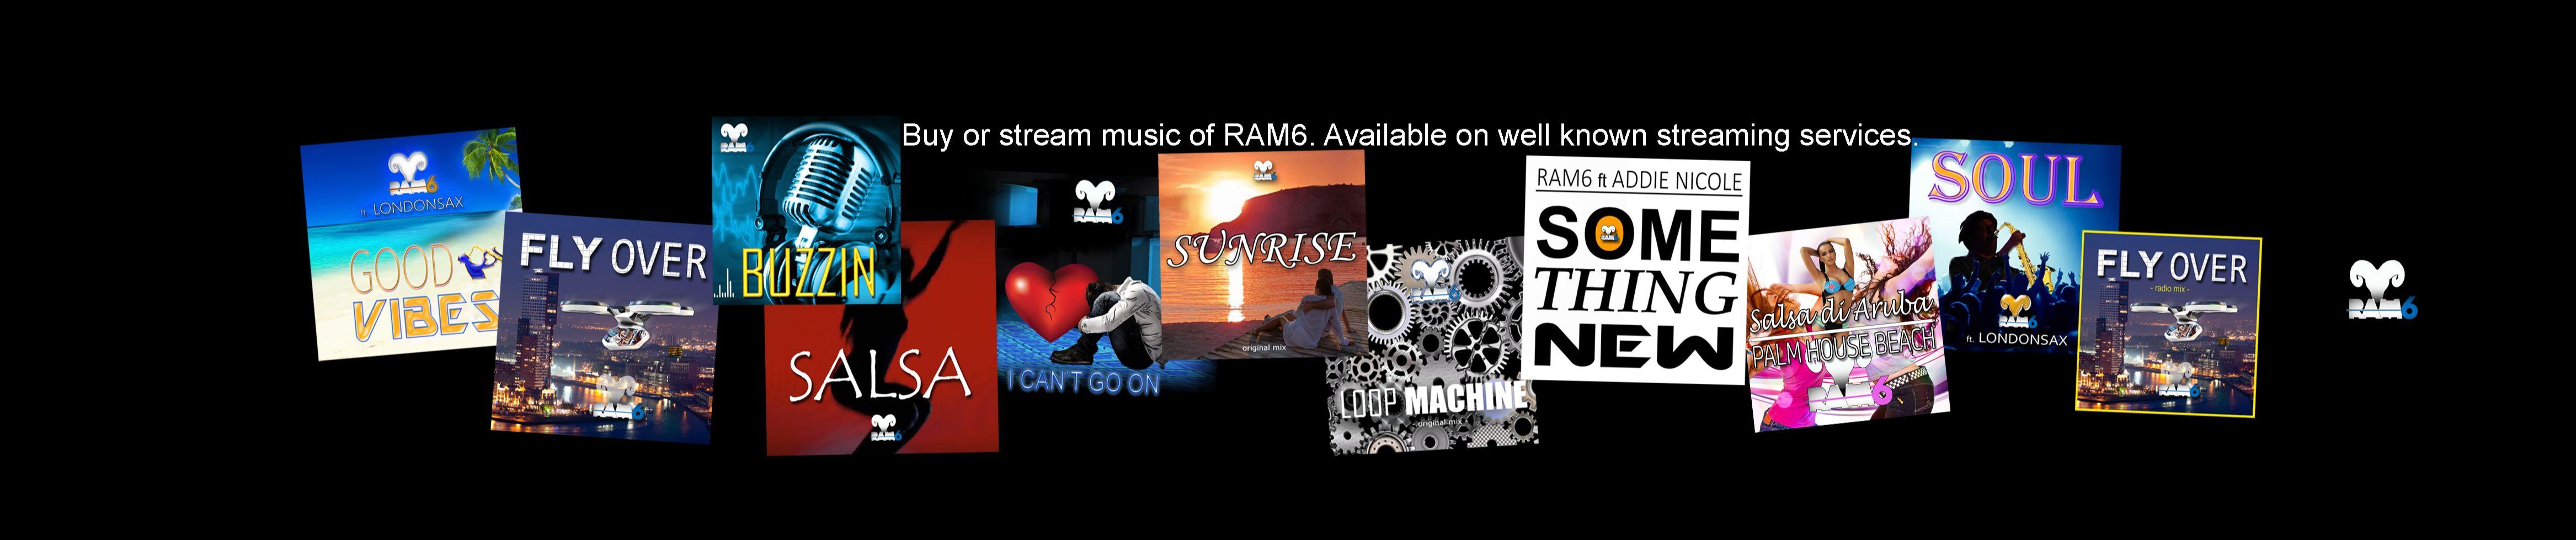 THE TRAMMPS - Disco Inferno, Burn Baby Burn (2016 REMIX RAM6